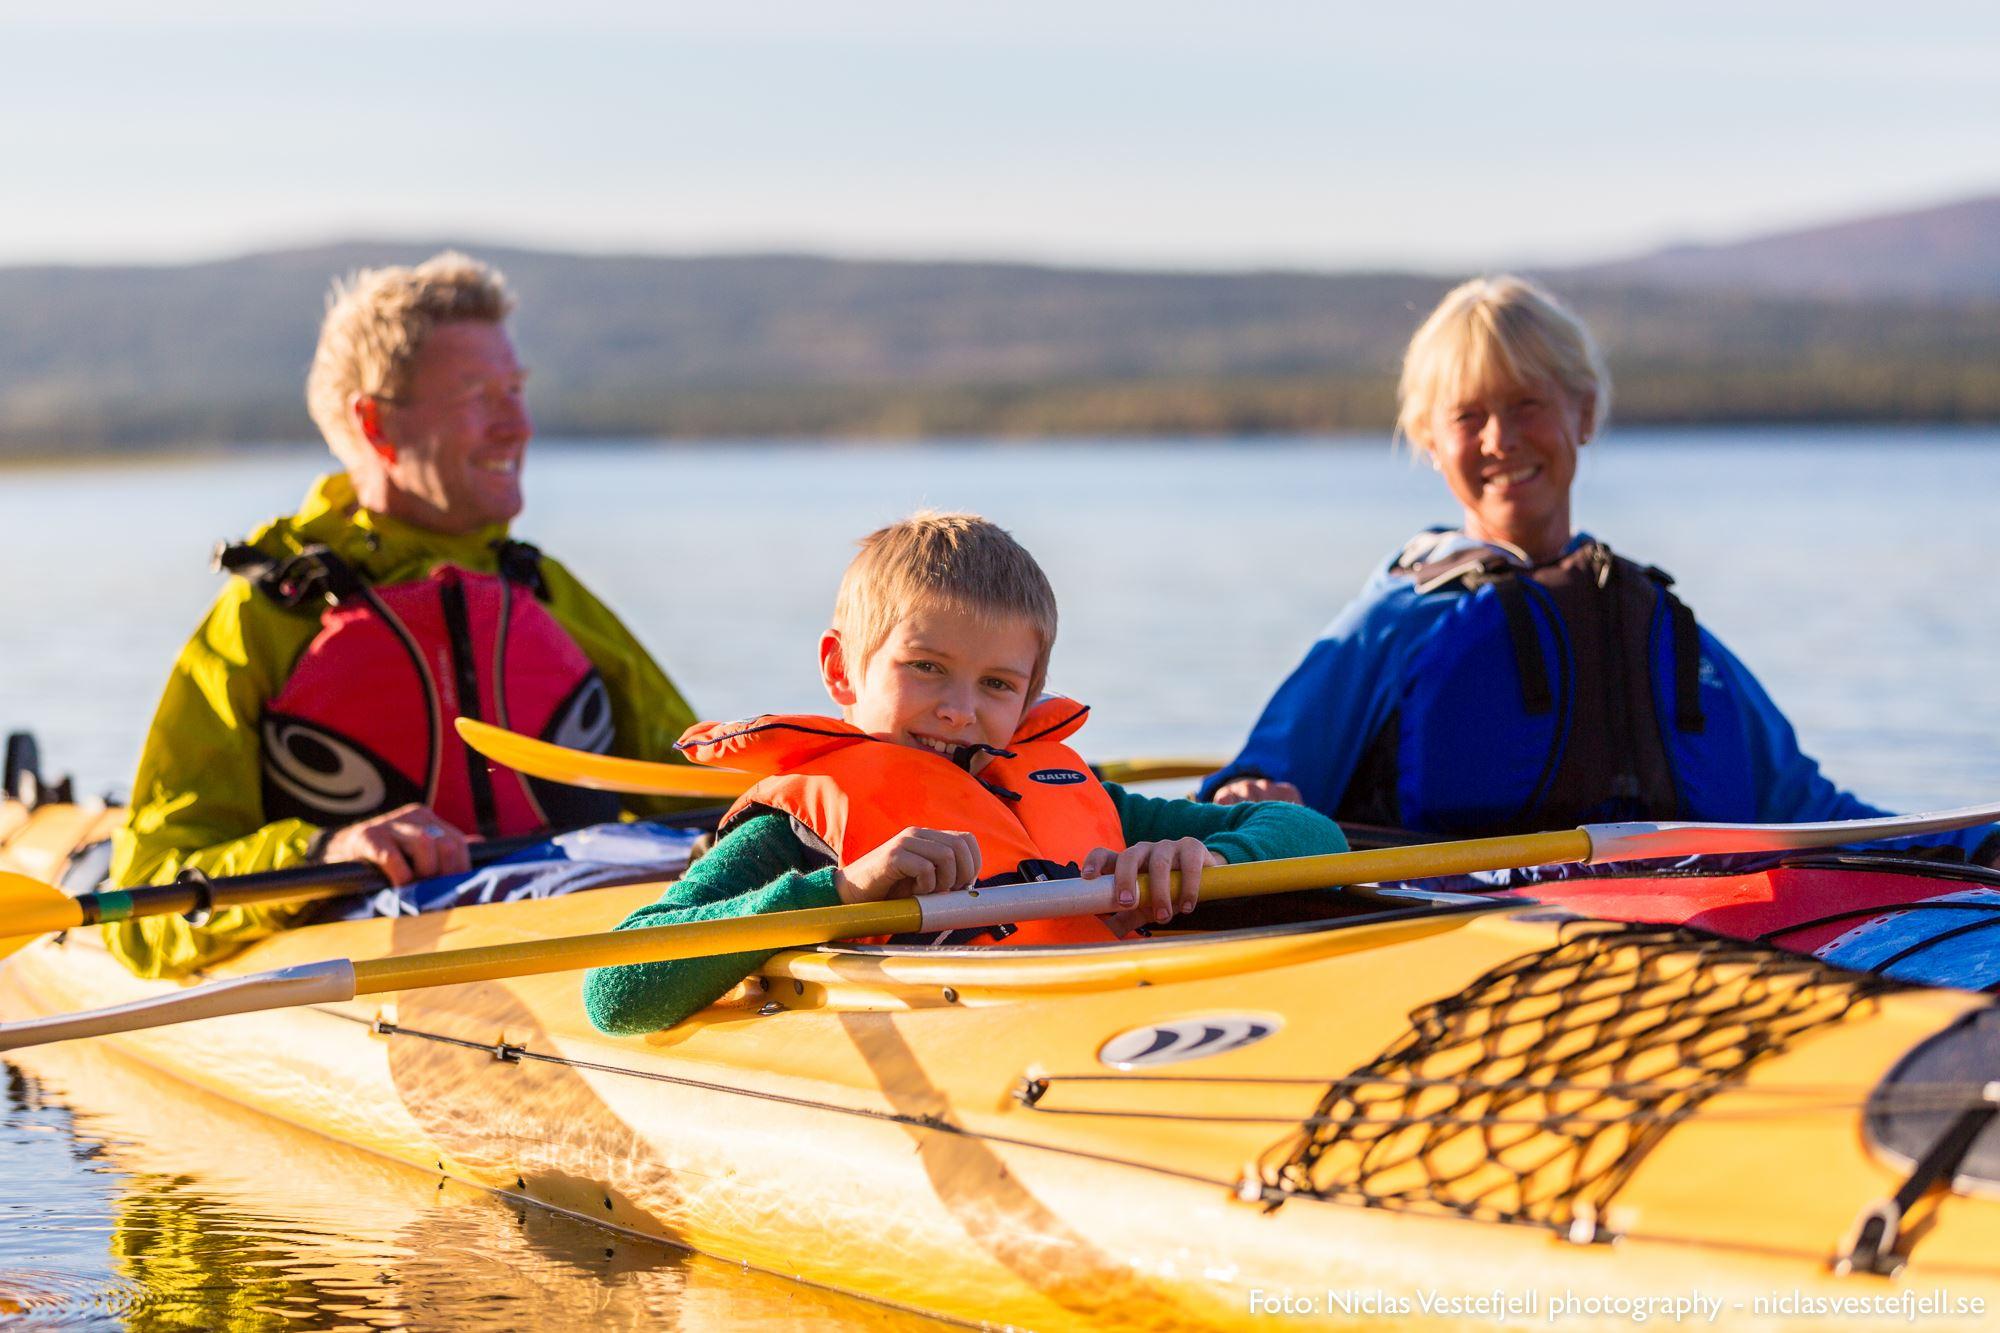 Paddla kajak på vilda, vackra Ottsjön